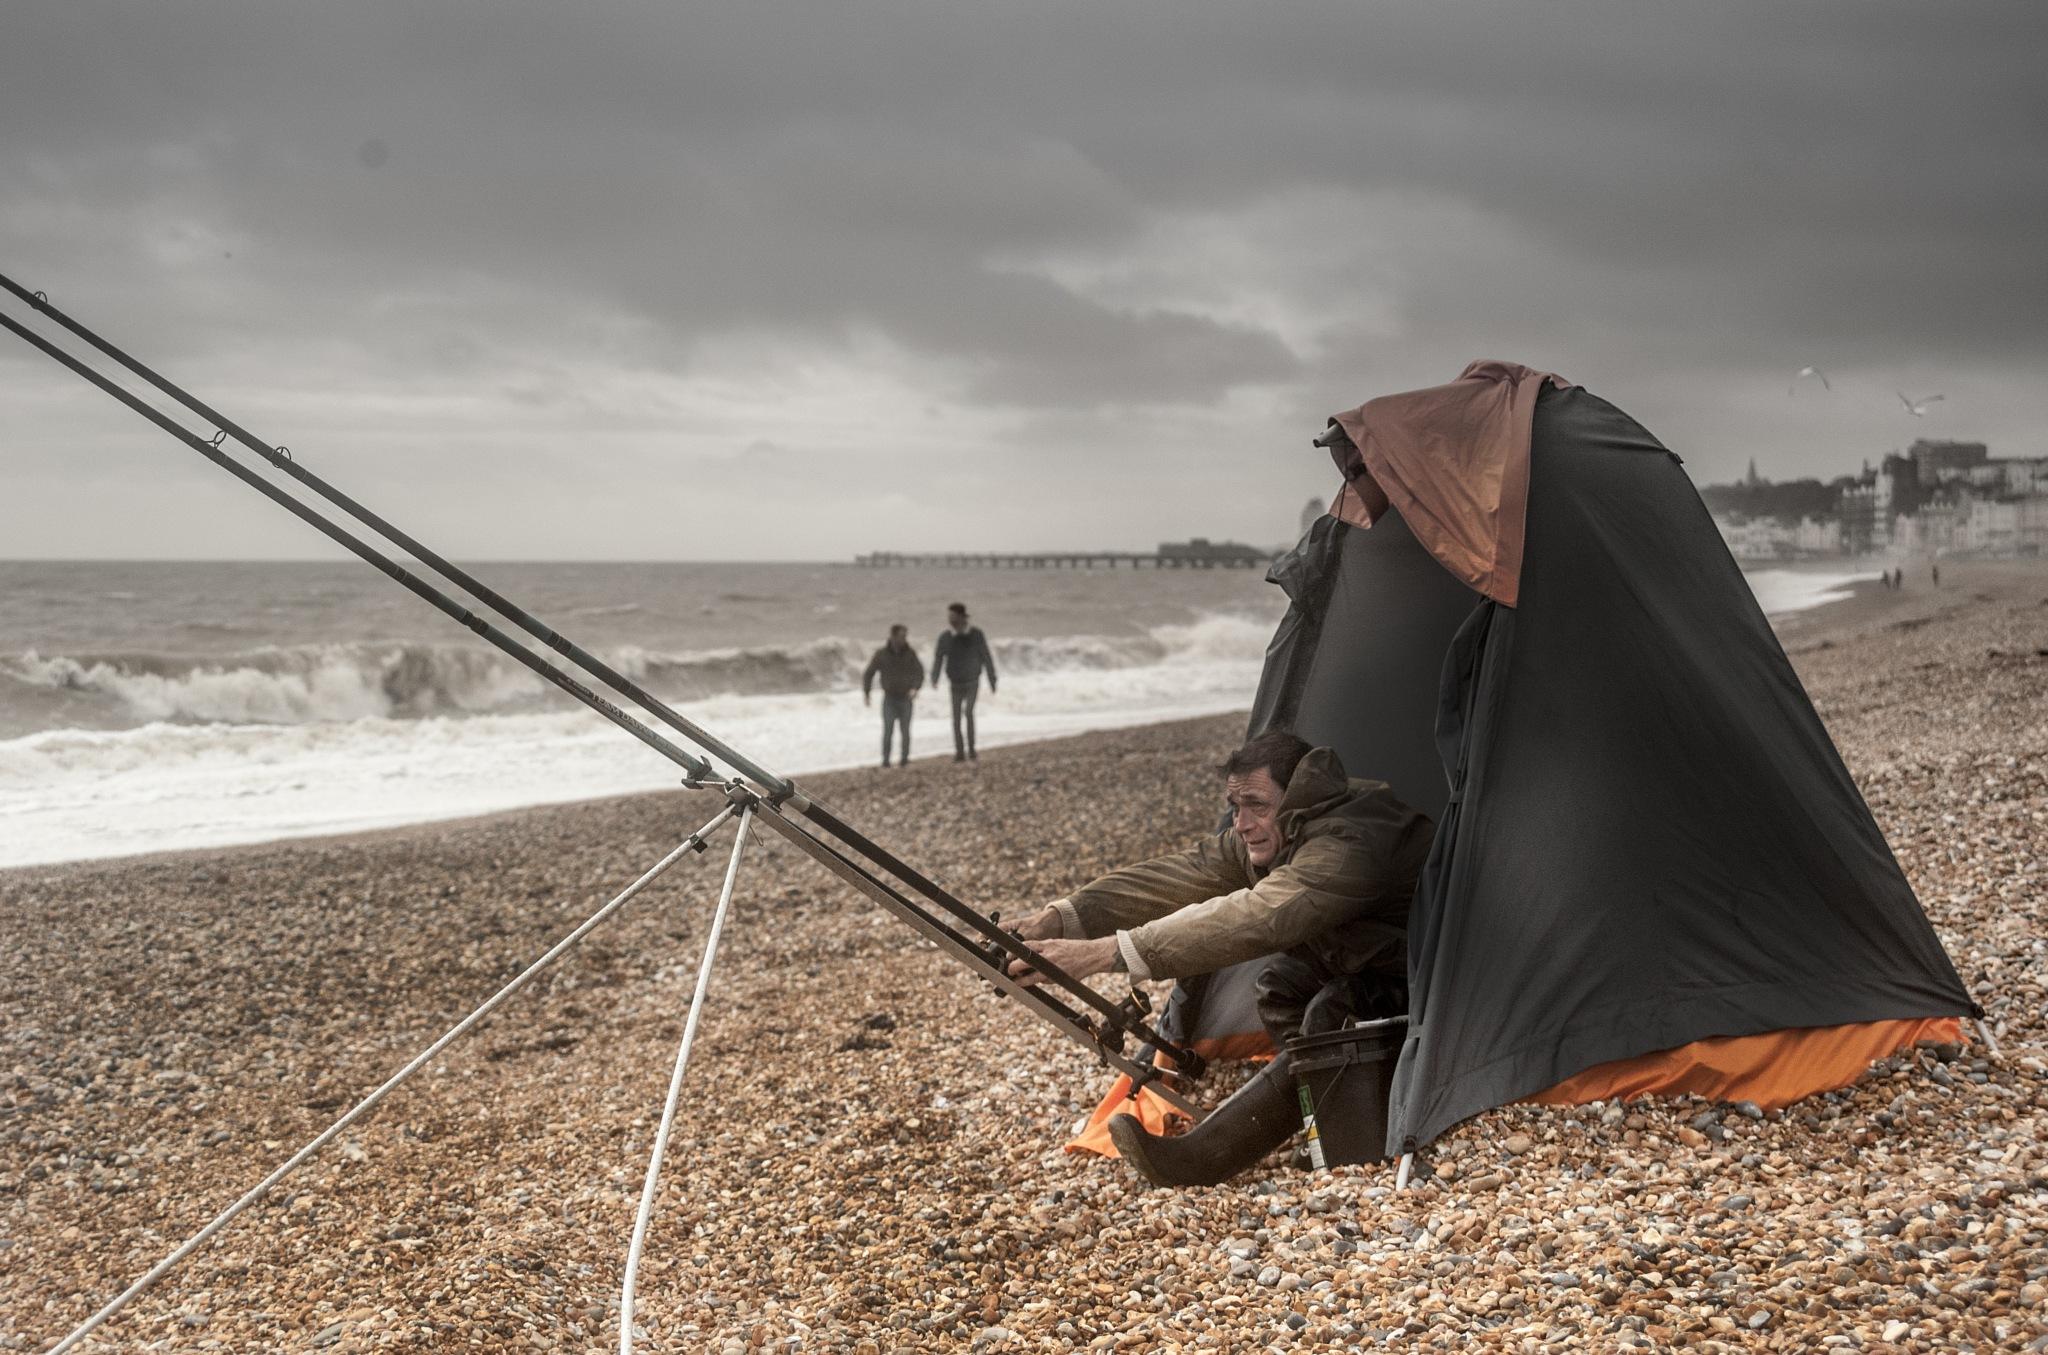 Fishing at Noon by xenamalhi86